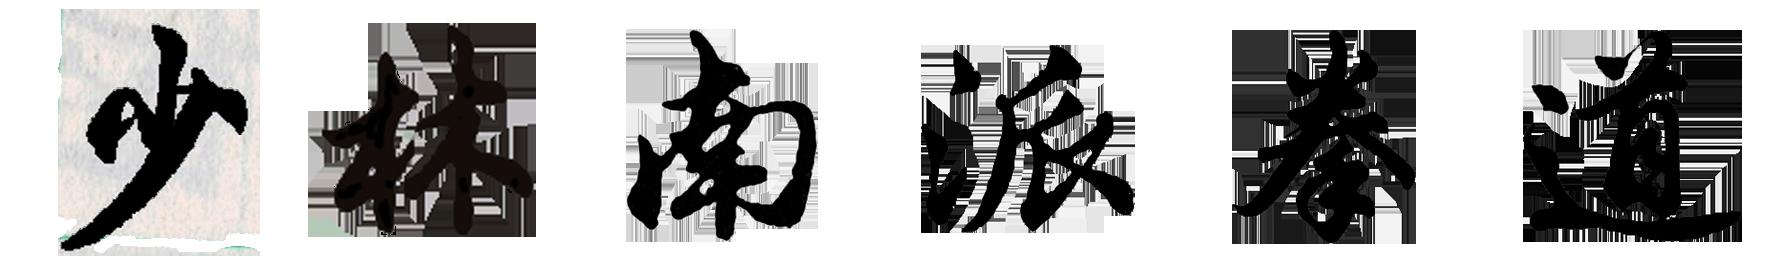 Li-shan-nan-pai-kun-tao-calligraphies